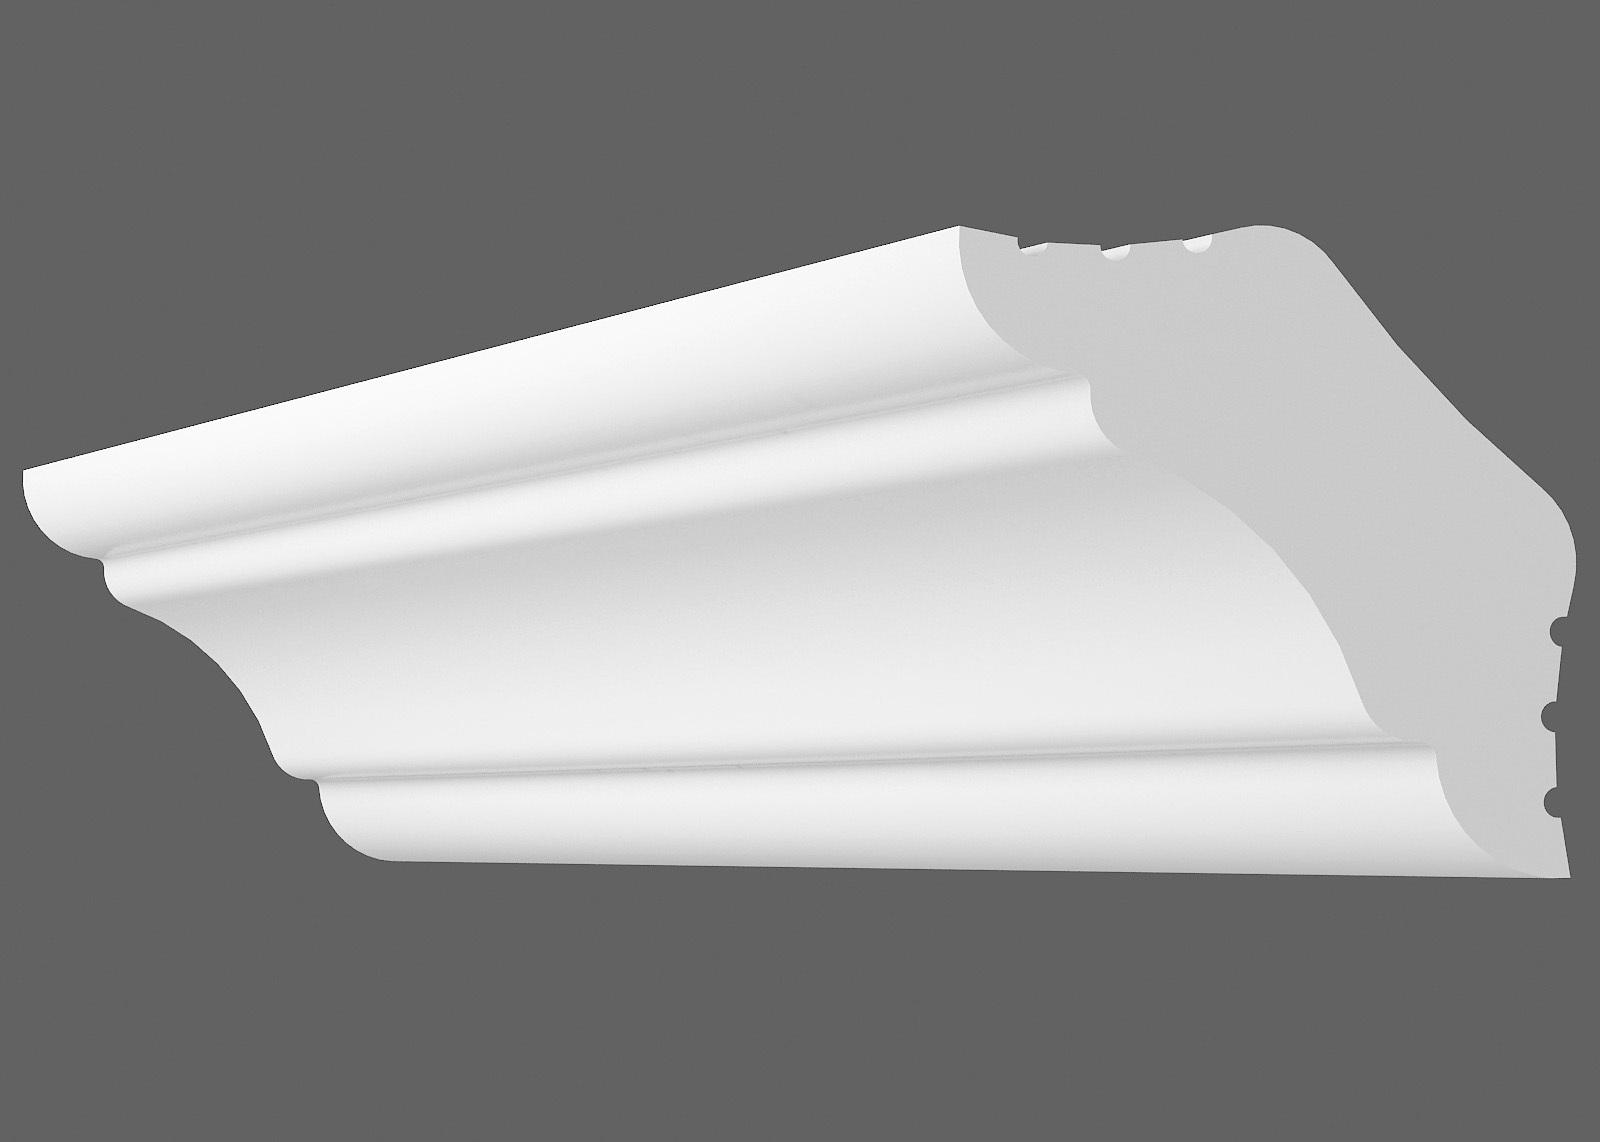 Потолочный плинтус К-30 (Размер:25х25мм)